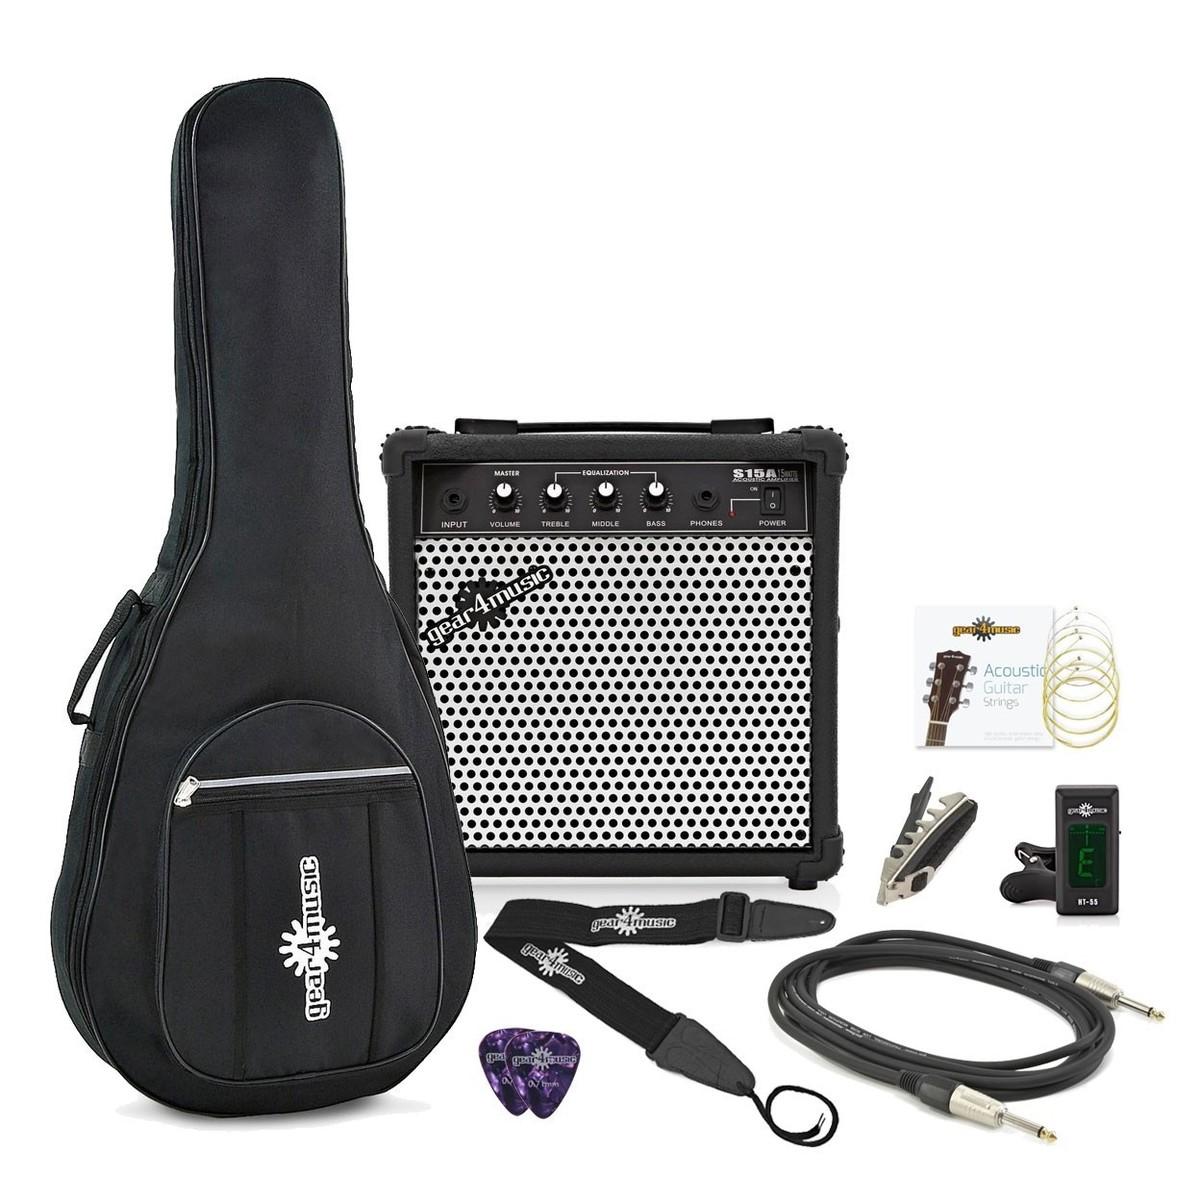 15 Watt Acoustic Guitar Amp & Accessory Pack